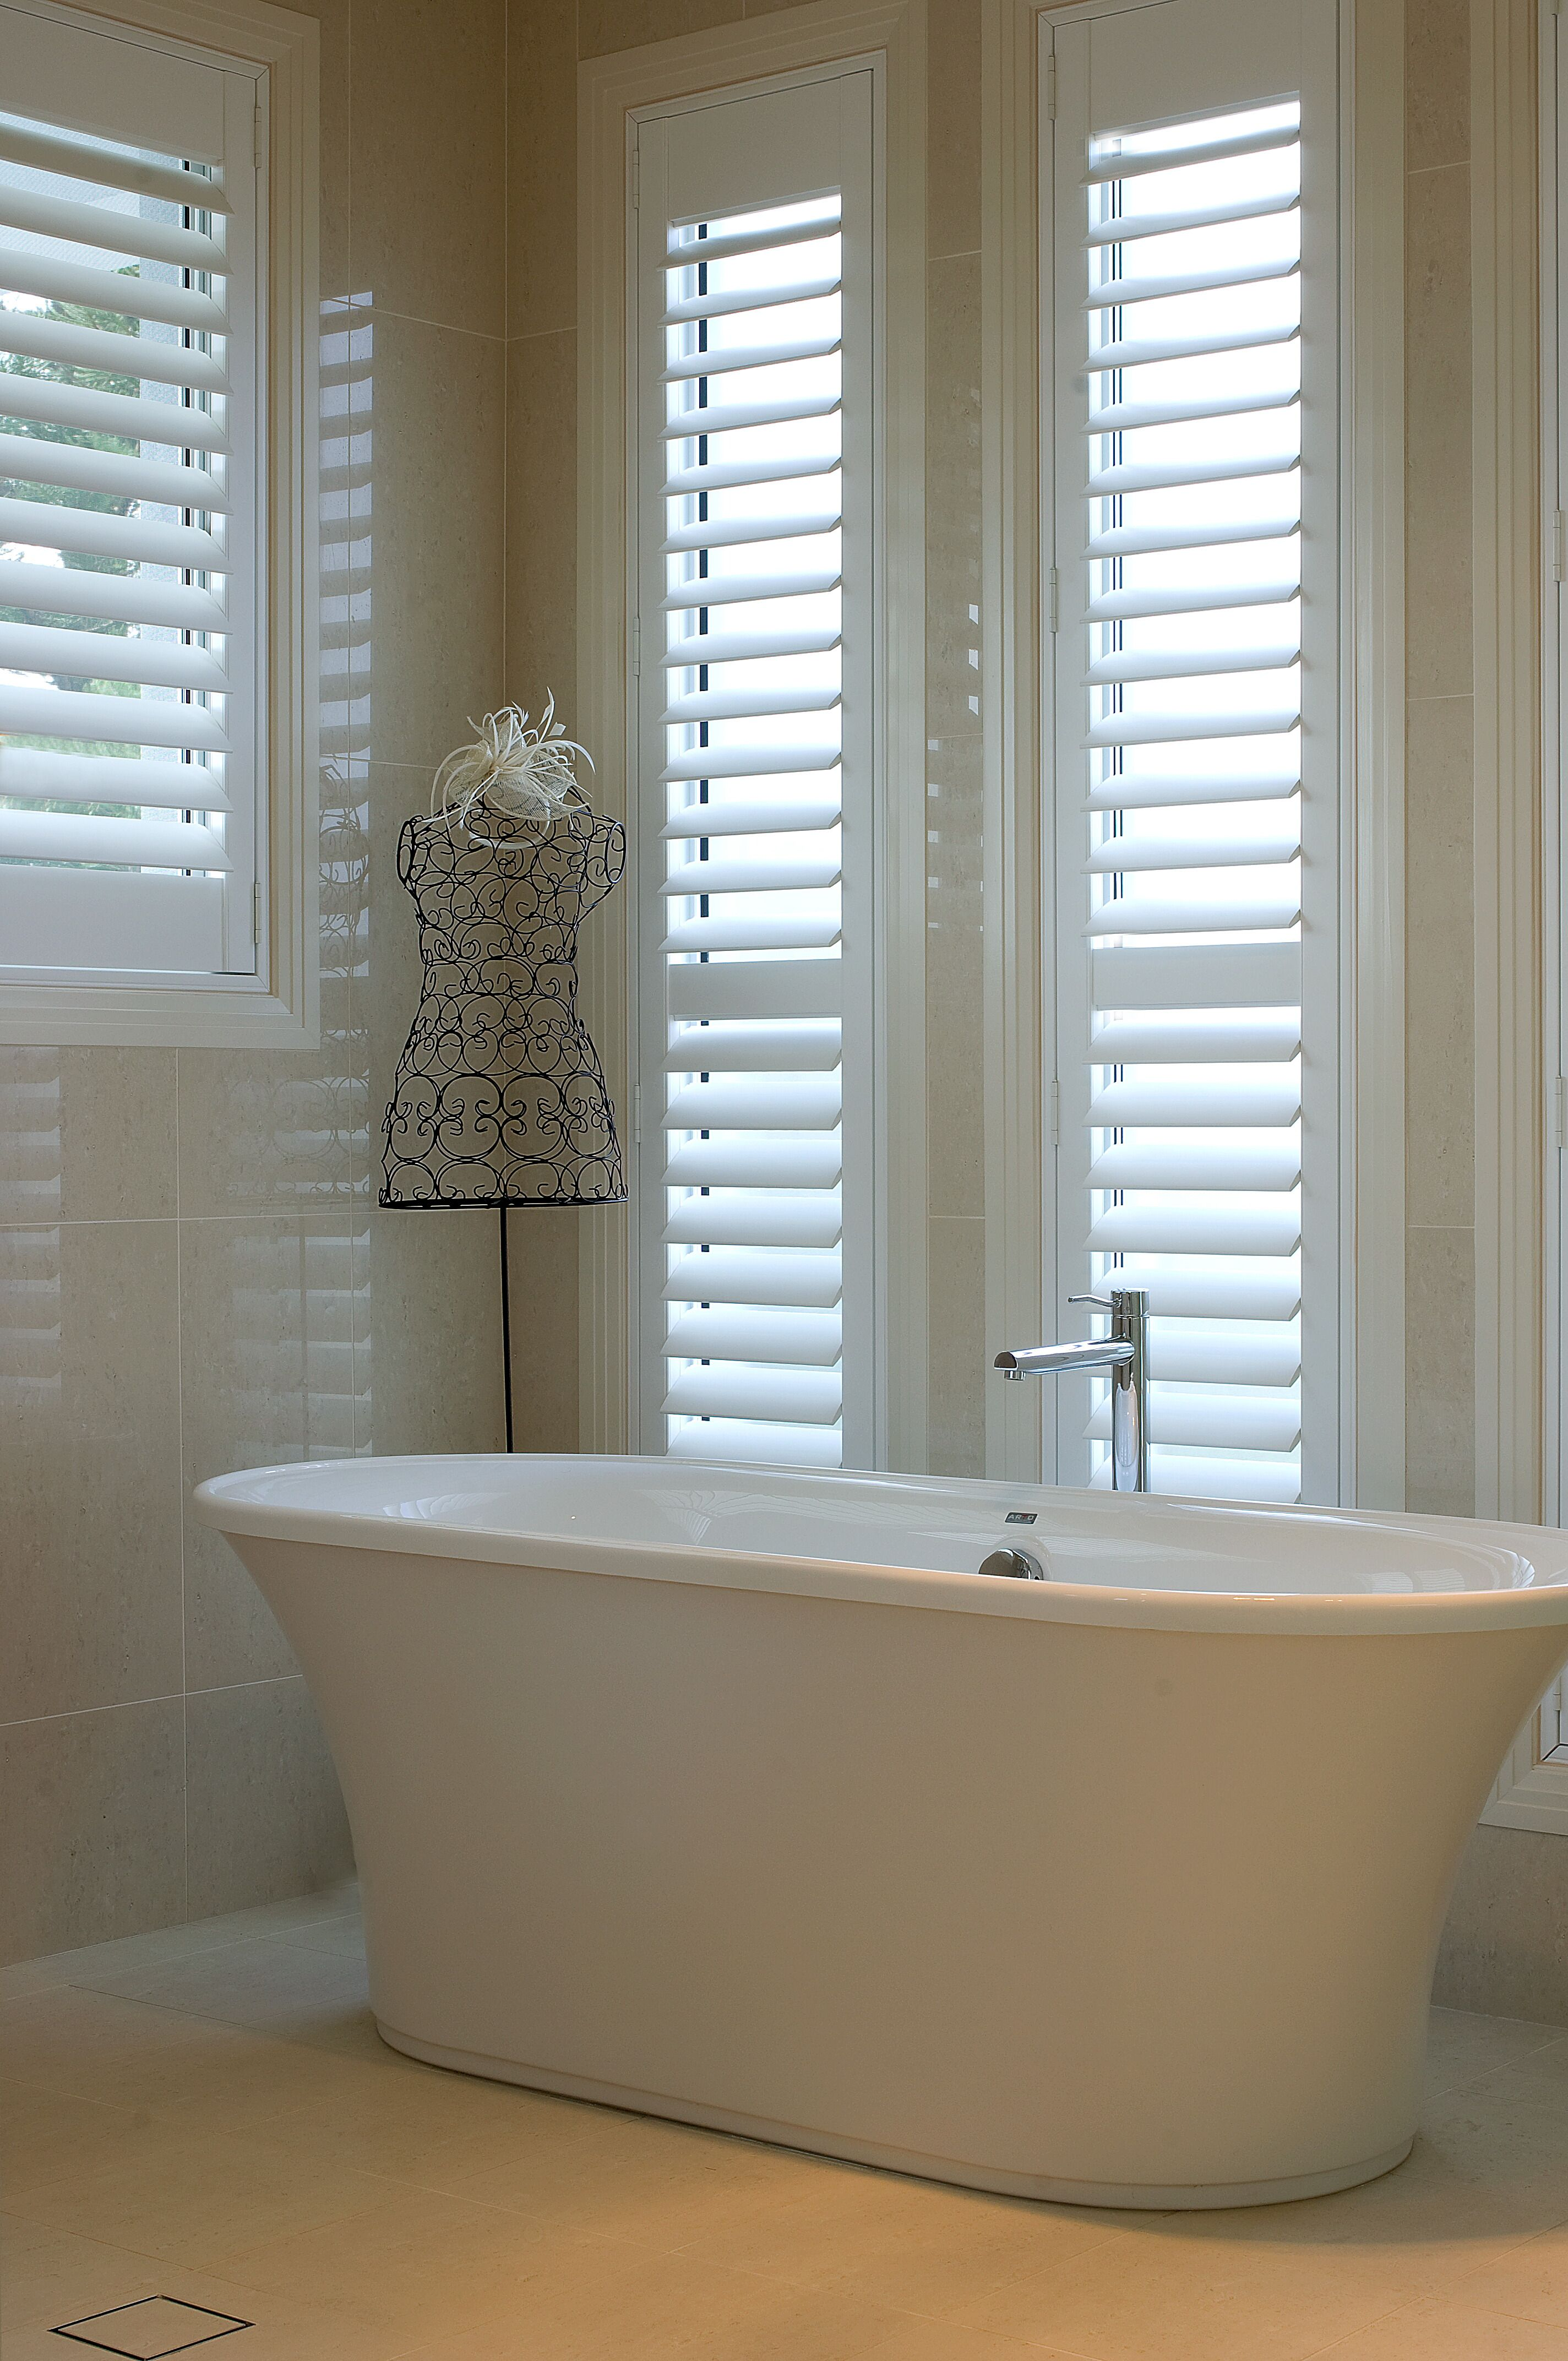 Macarthur home improvements i plantation shutters interior design